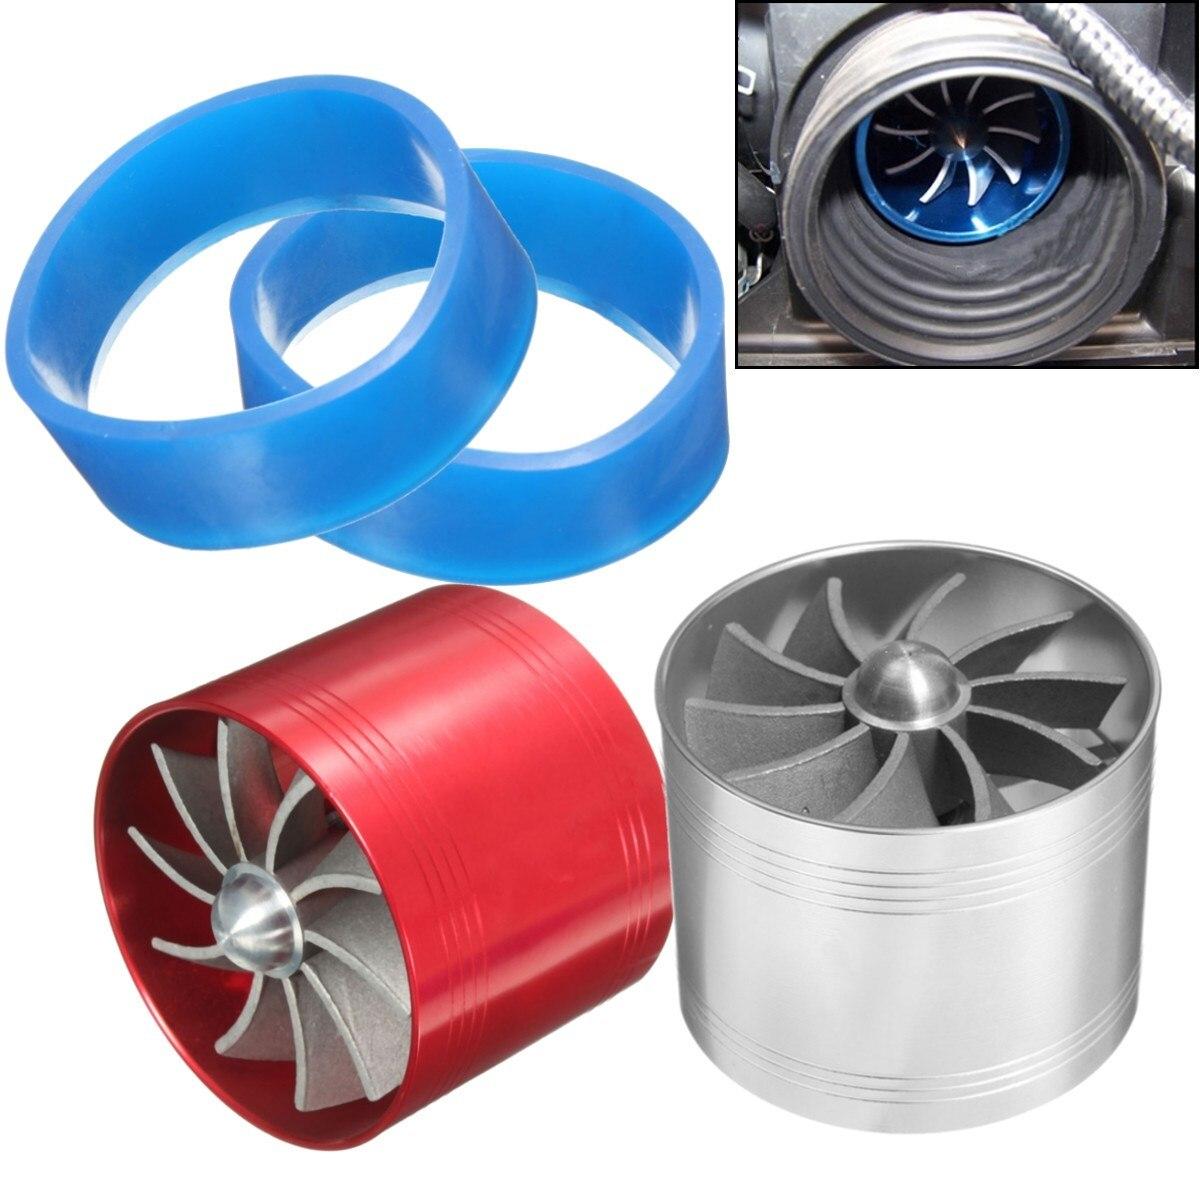 Universal 64.5mm x 50mm filtro de entrada de aire del coche ventilador fuel gas Saver supercharger turbina Turbo cargador Turbocompresores